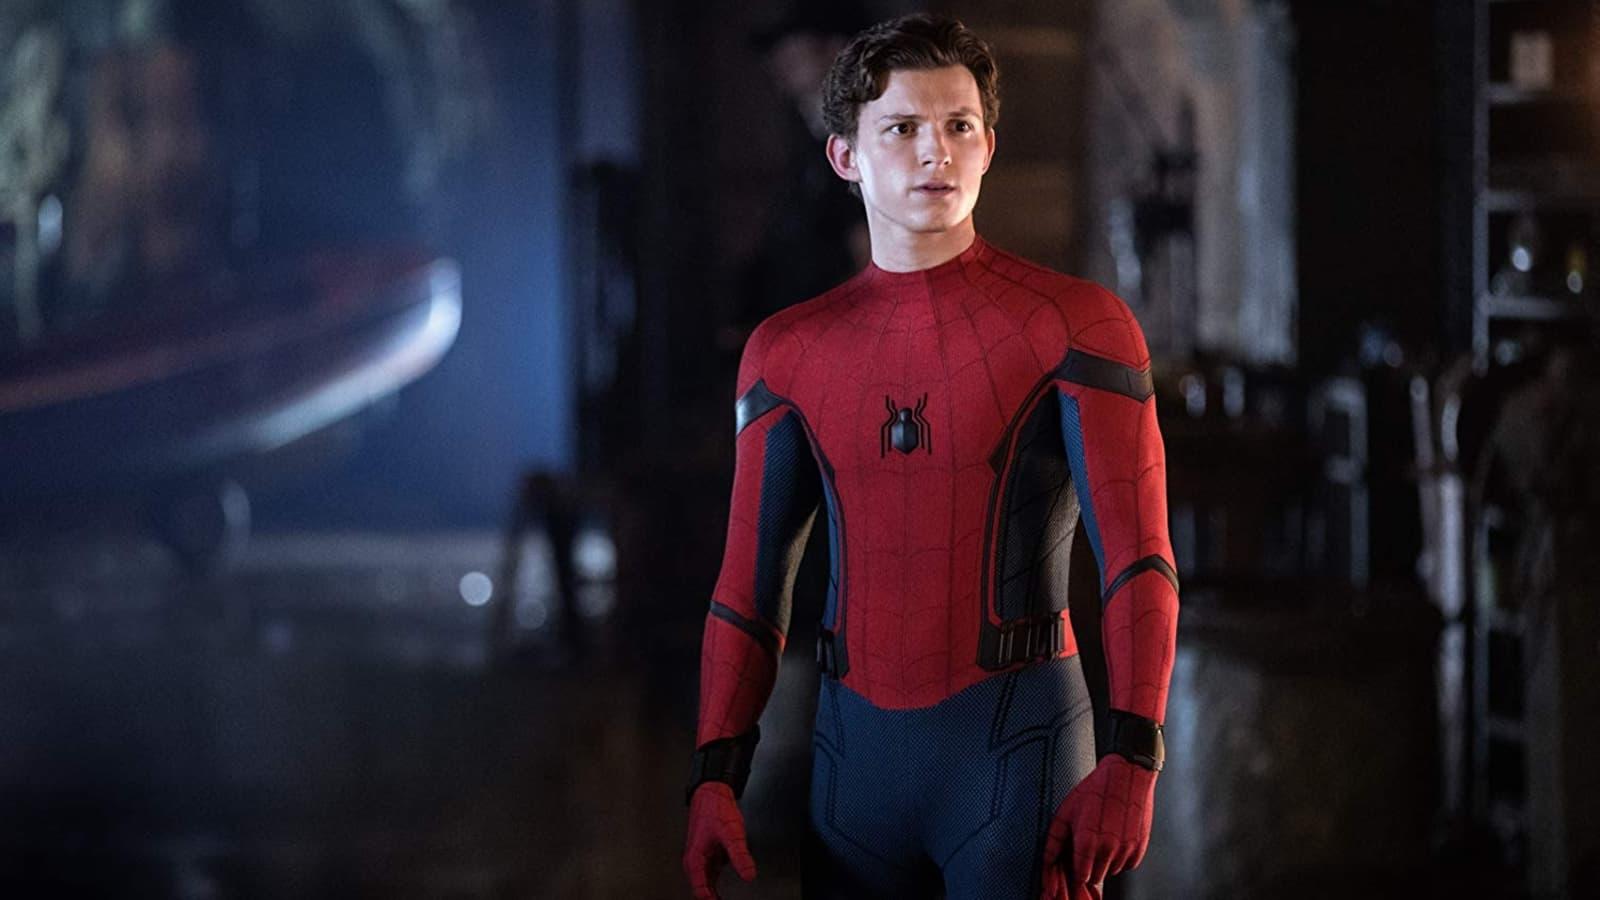 Spider man meet tony stark